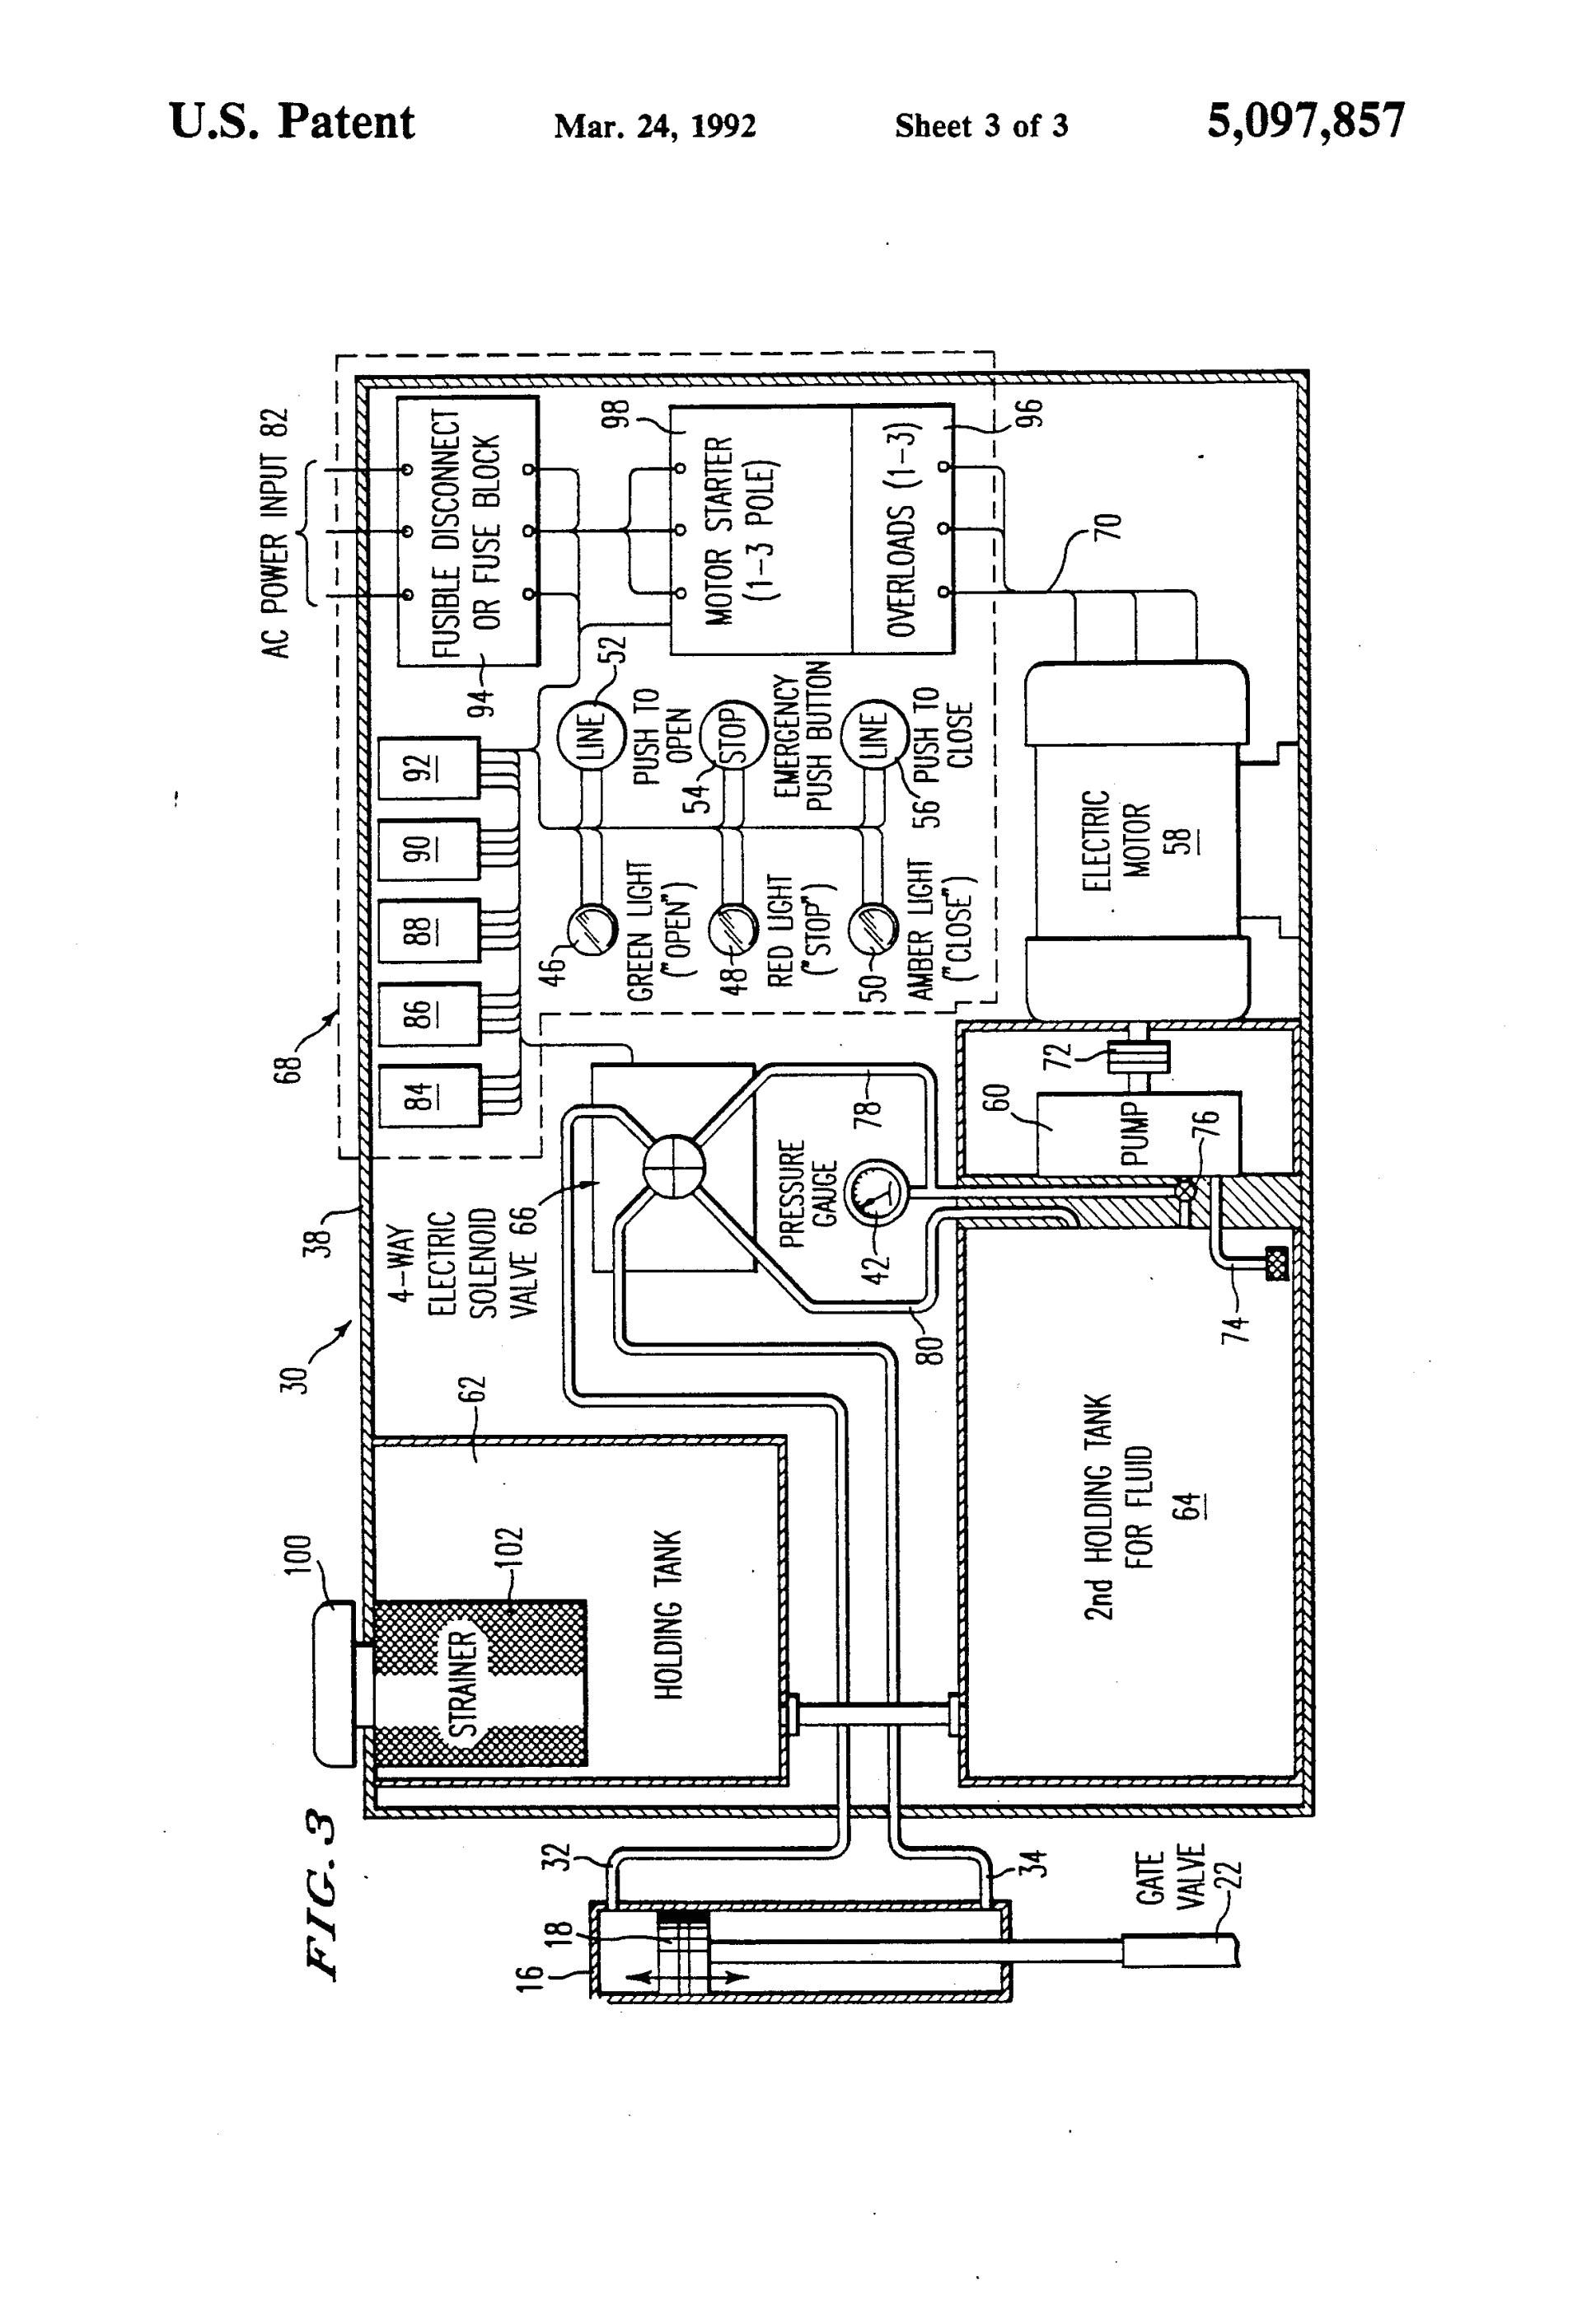 Rotork Electric Actuator Wiring Diagram Linak Actuator Wiring Diagram Wiring Diagram Database